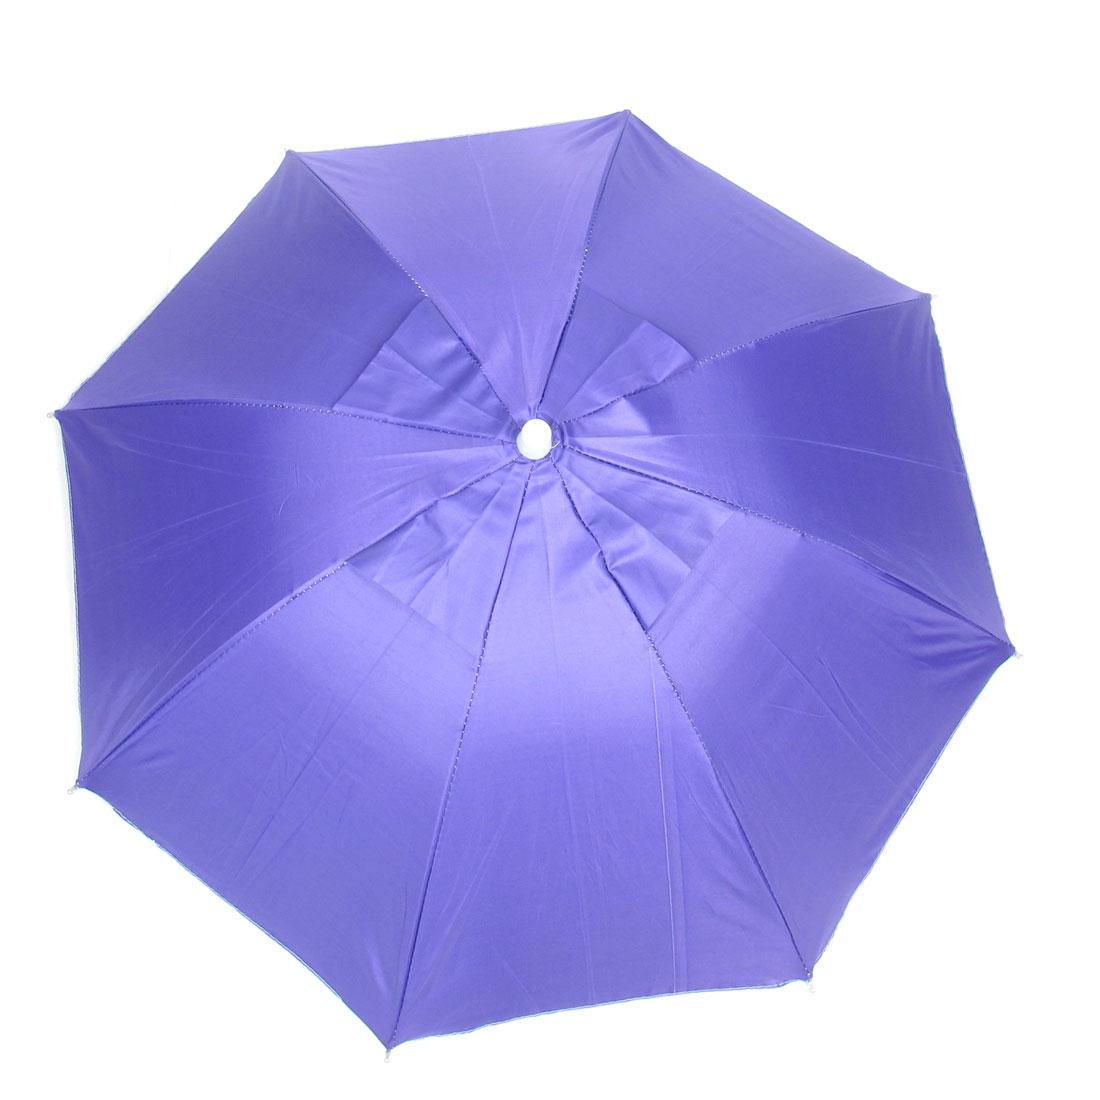 Black Elastic Headband 8 Metal Ribs Purple Umbrella Hat